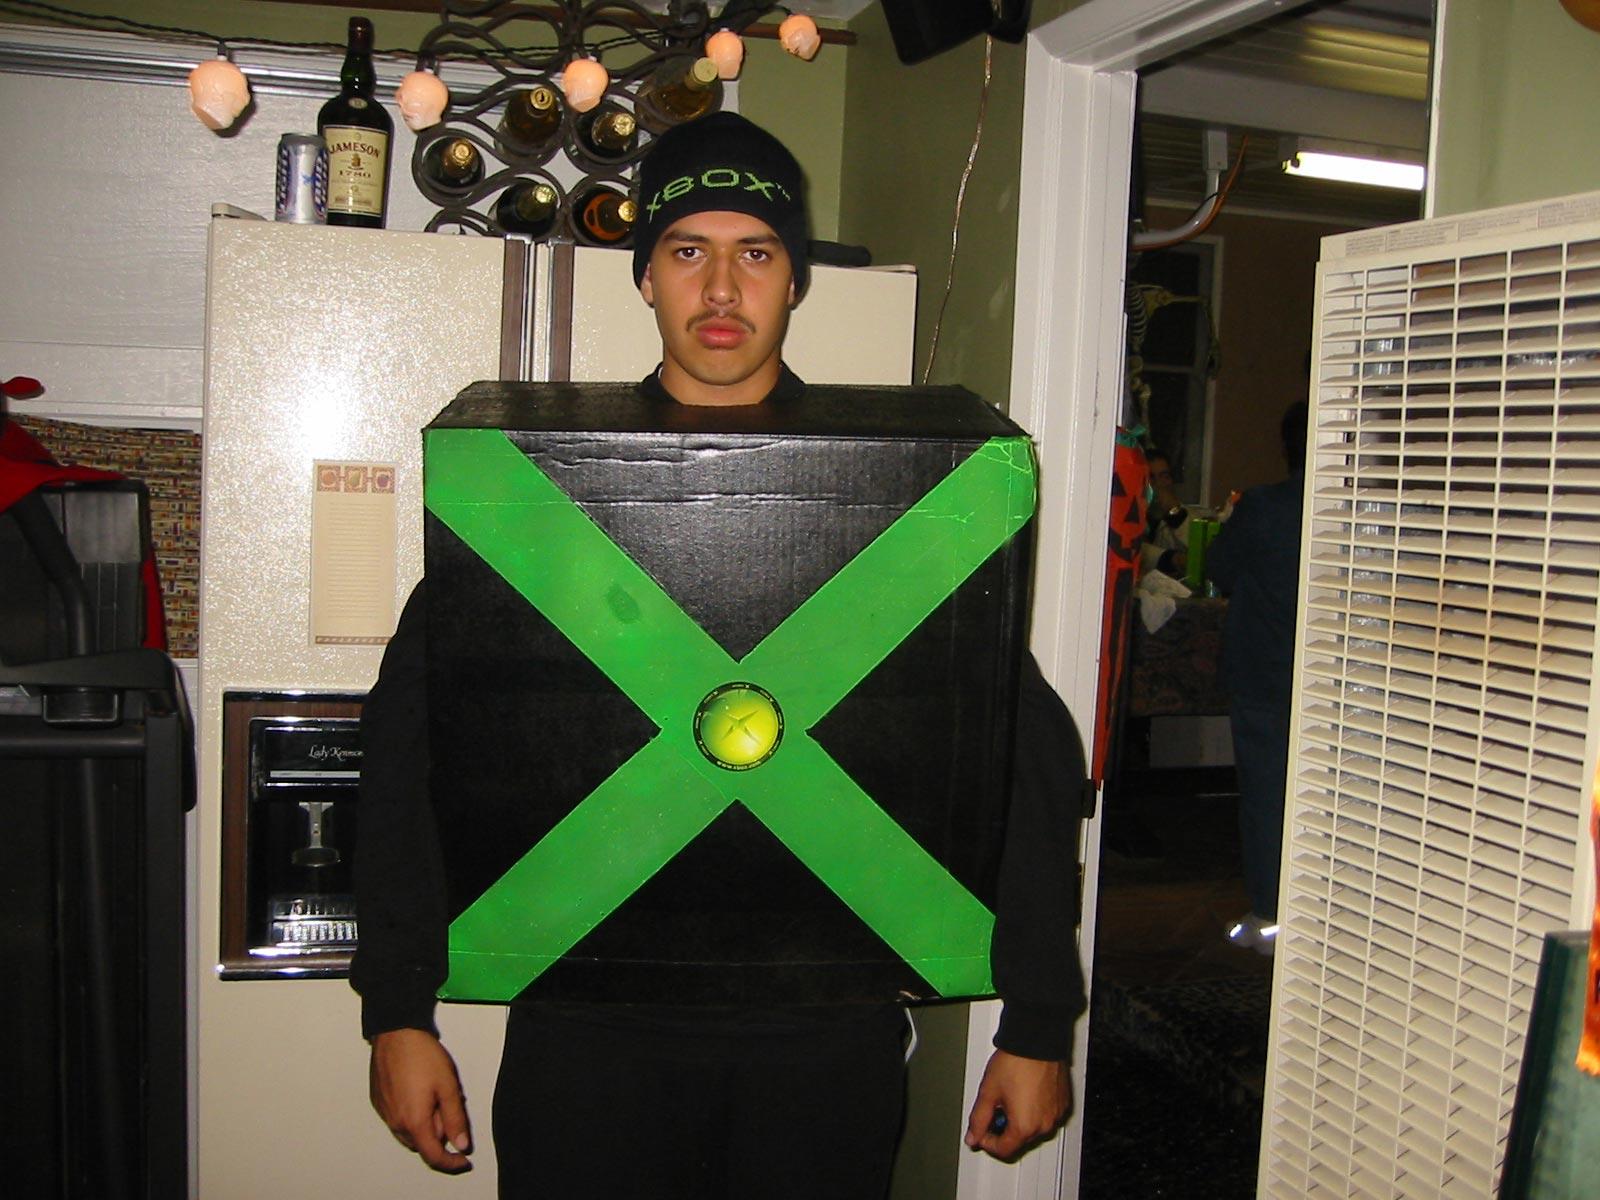 HalloWeen: Bad, Sad, and Funny Halloween Costumes 2013